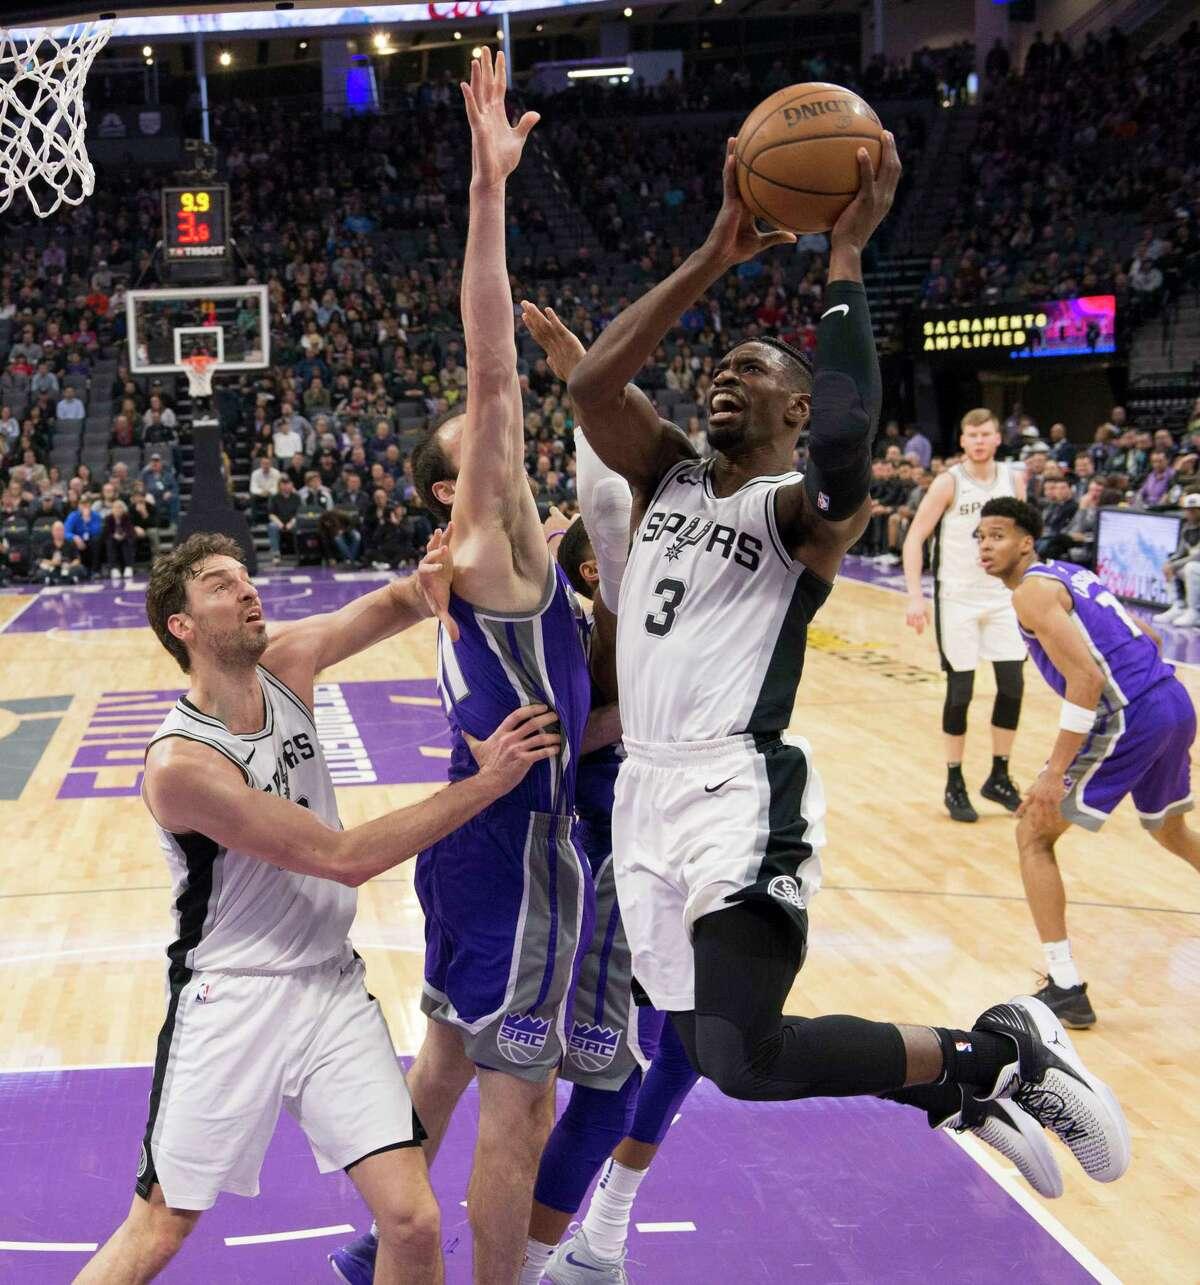 San Antonio Spurs guard Brandon Paul (3) goes to the basket against the Sacramento Kings center Kosta Koufos (41) in the first quarter on Monday, Jan. 8, 2018 at the Golden 1 Center in Sacramento, Calif.